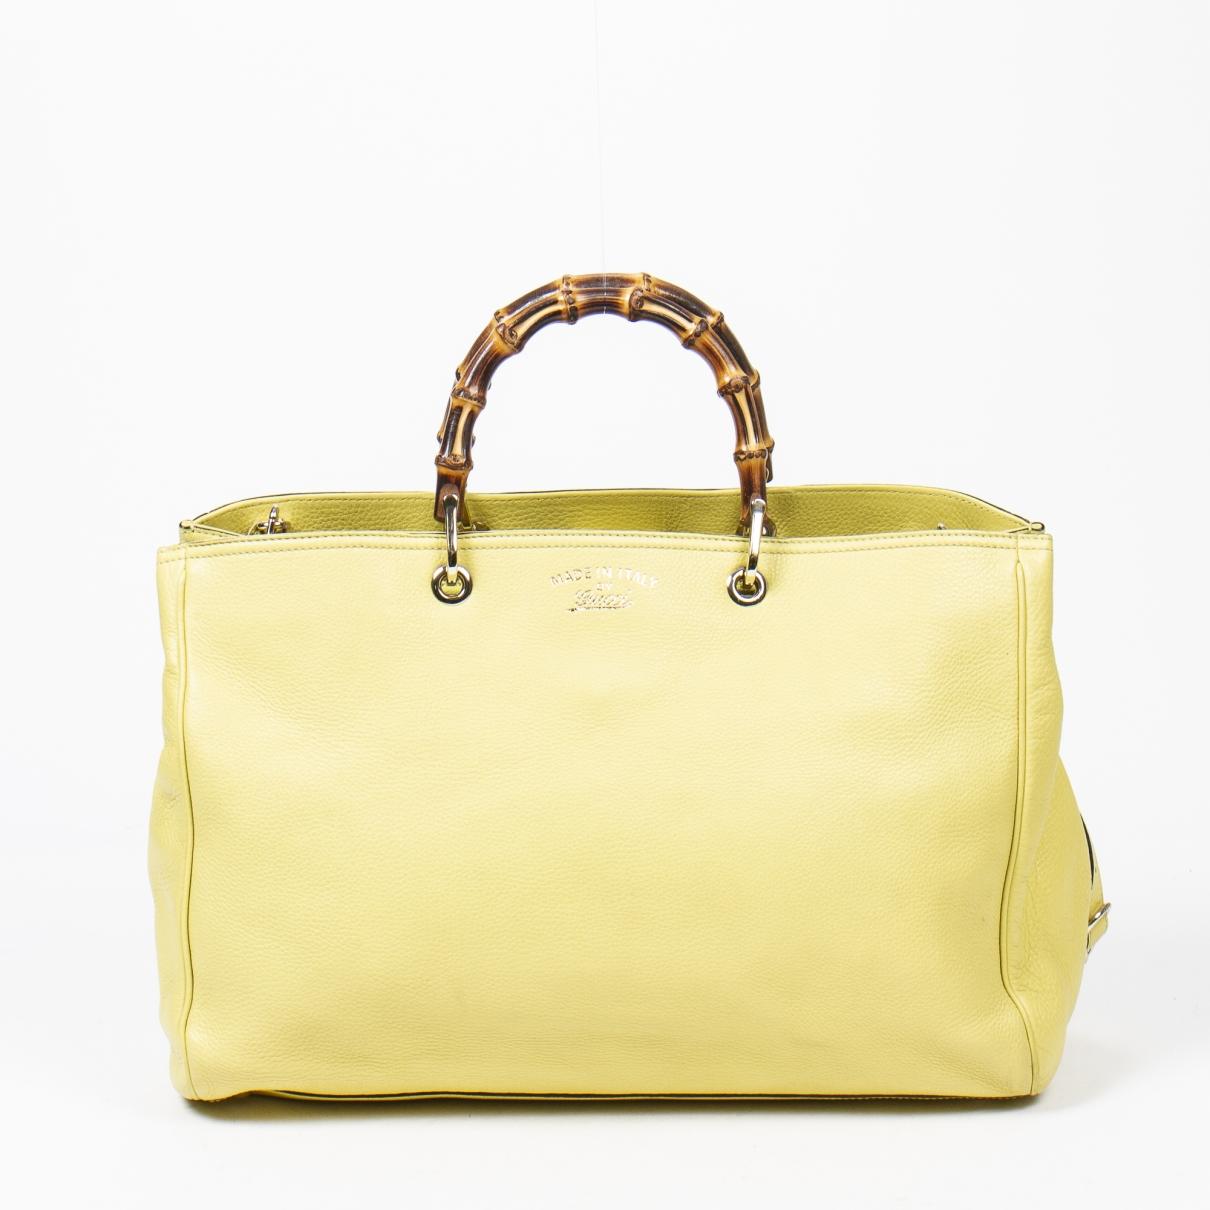 Gucci Bamboo Handtasche in  Gelb Leder